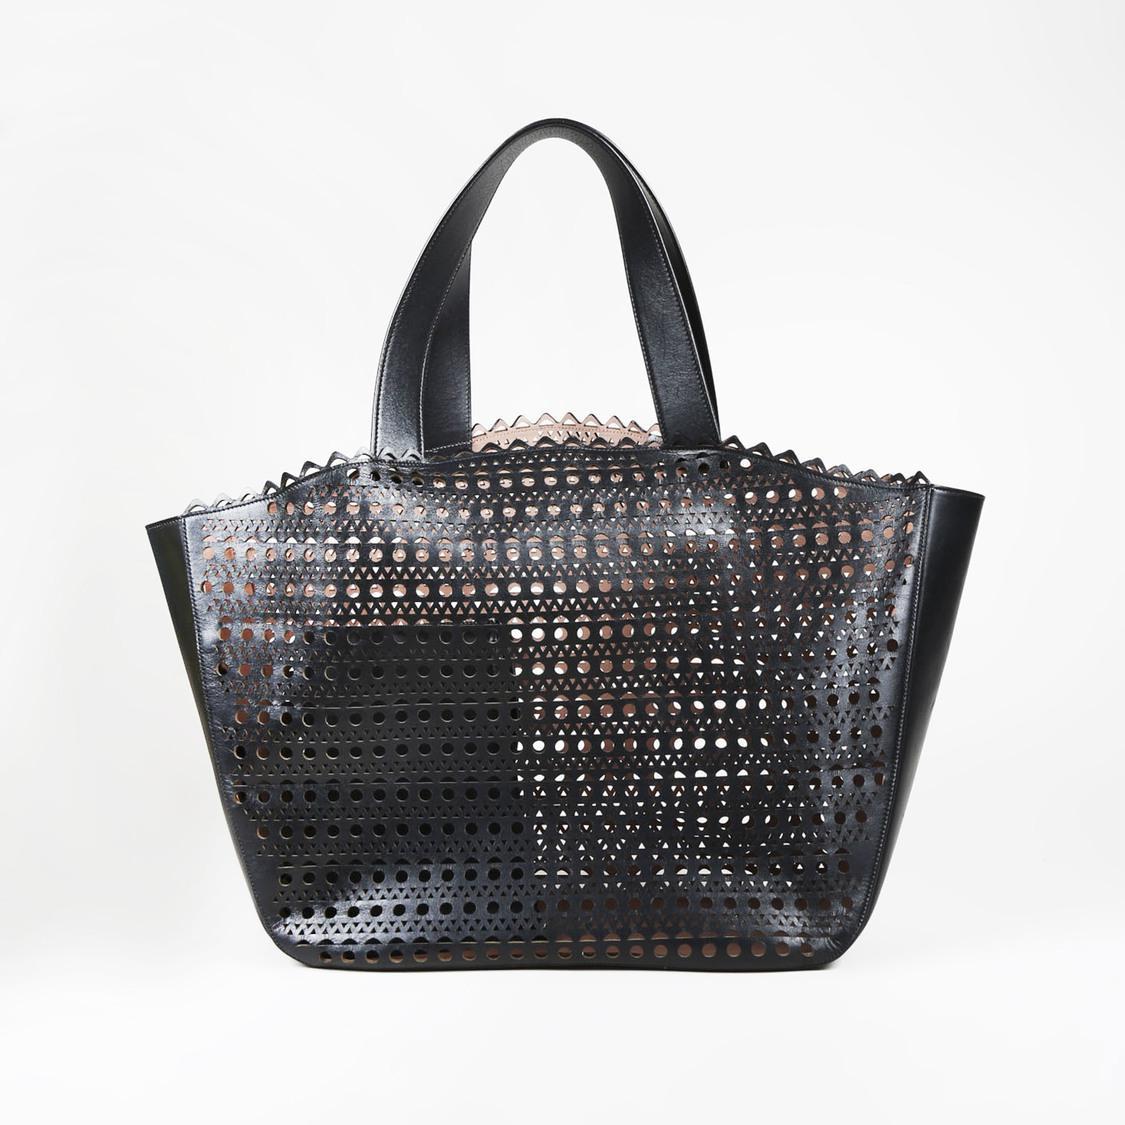 279f238cb Alaïa Black Laser Cut Leather Tote in Black - Lyst